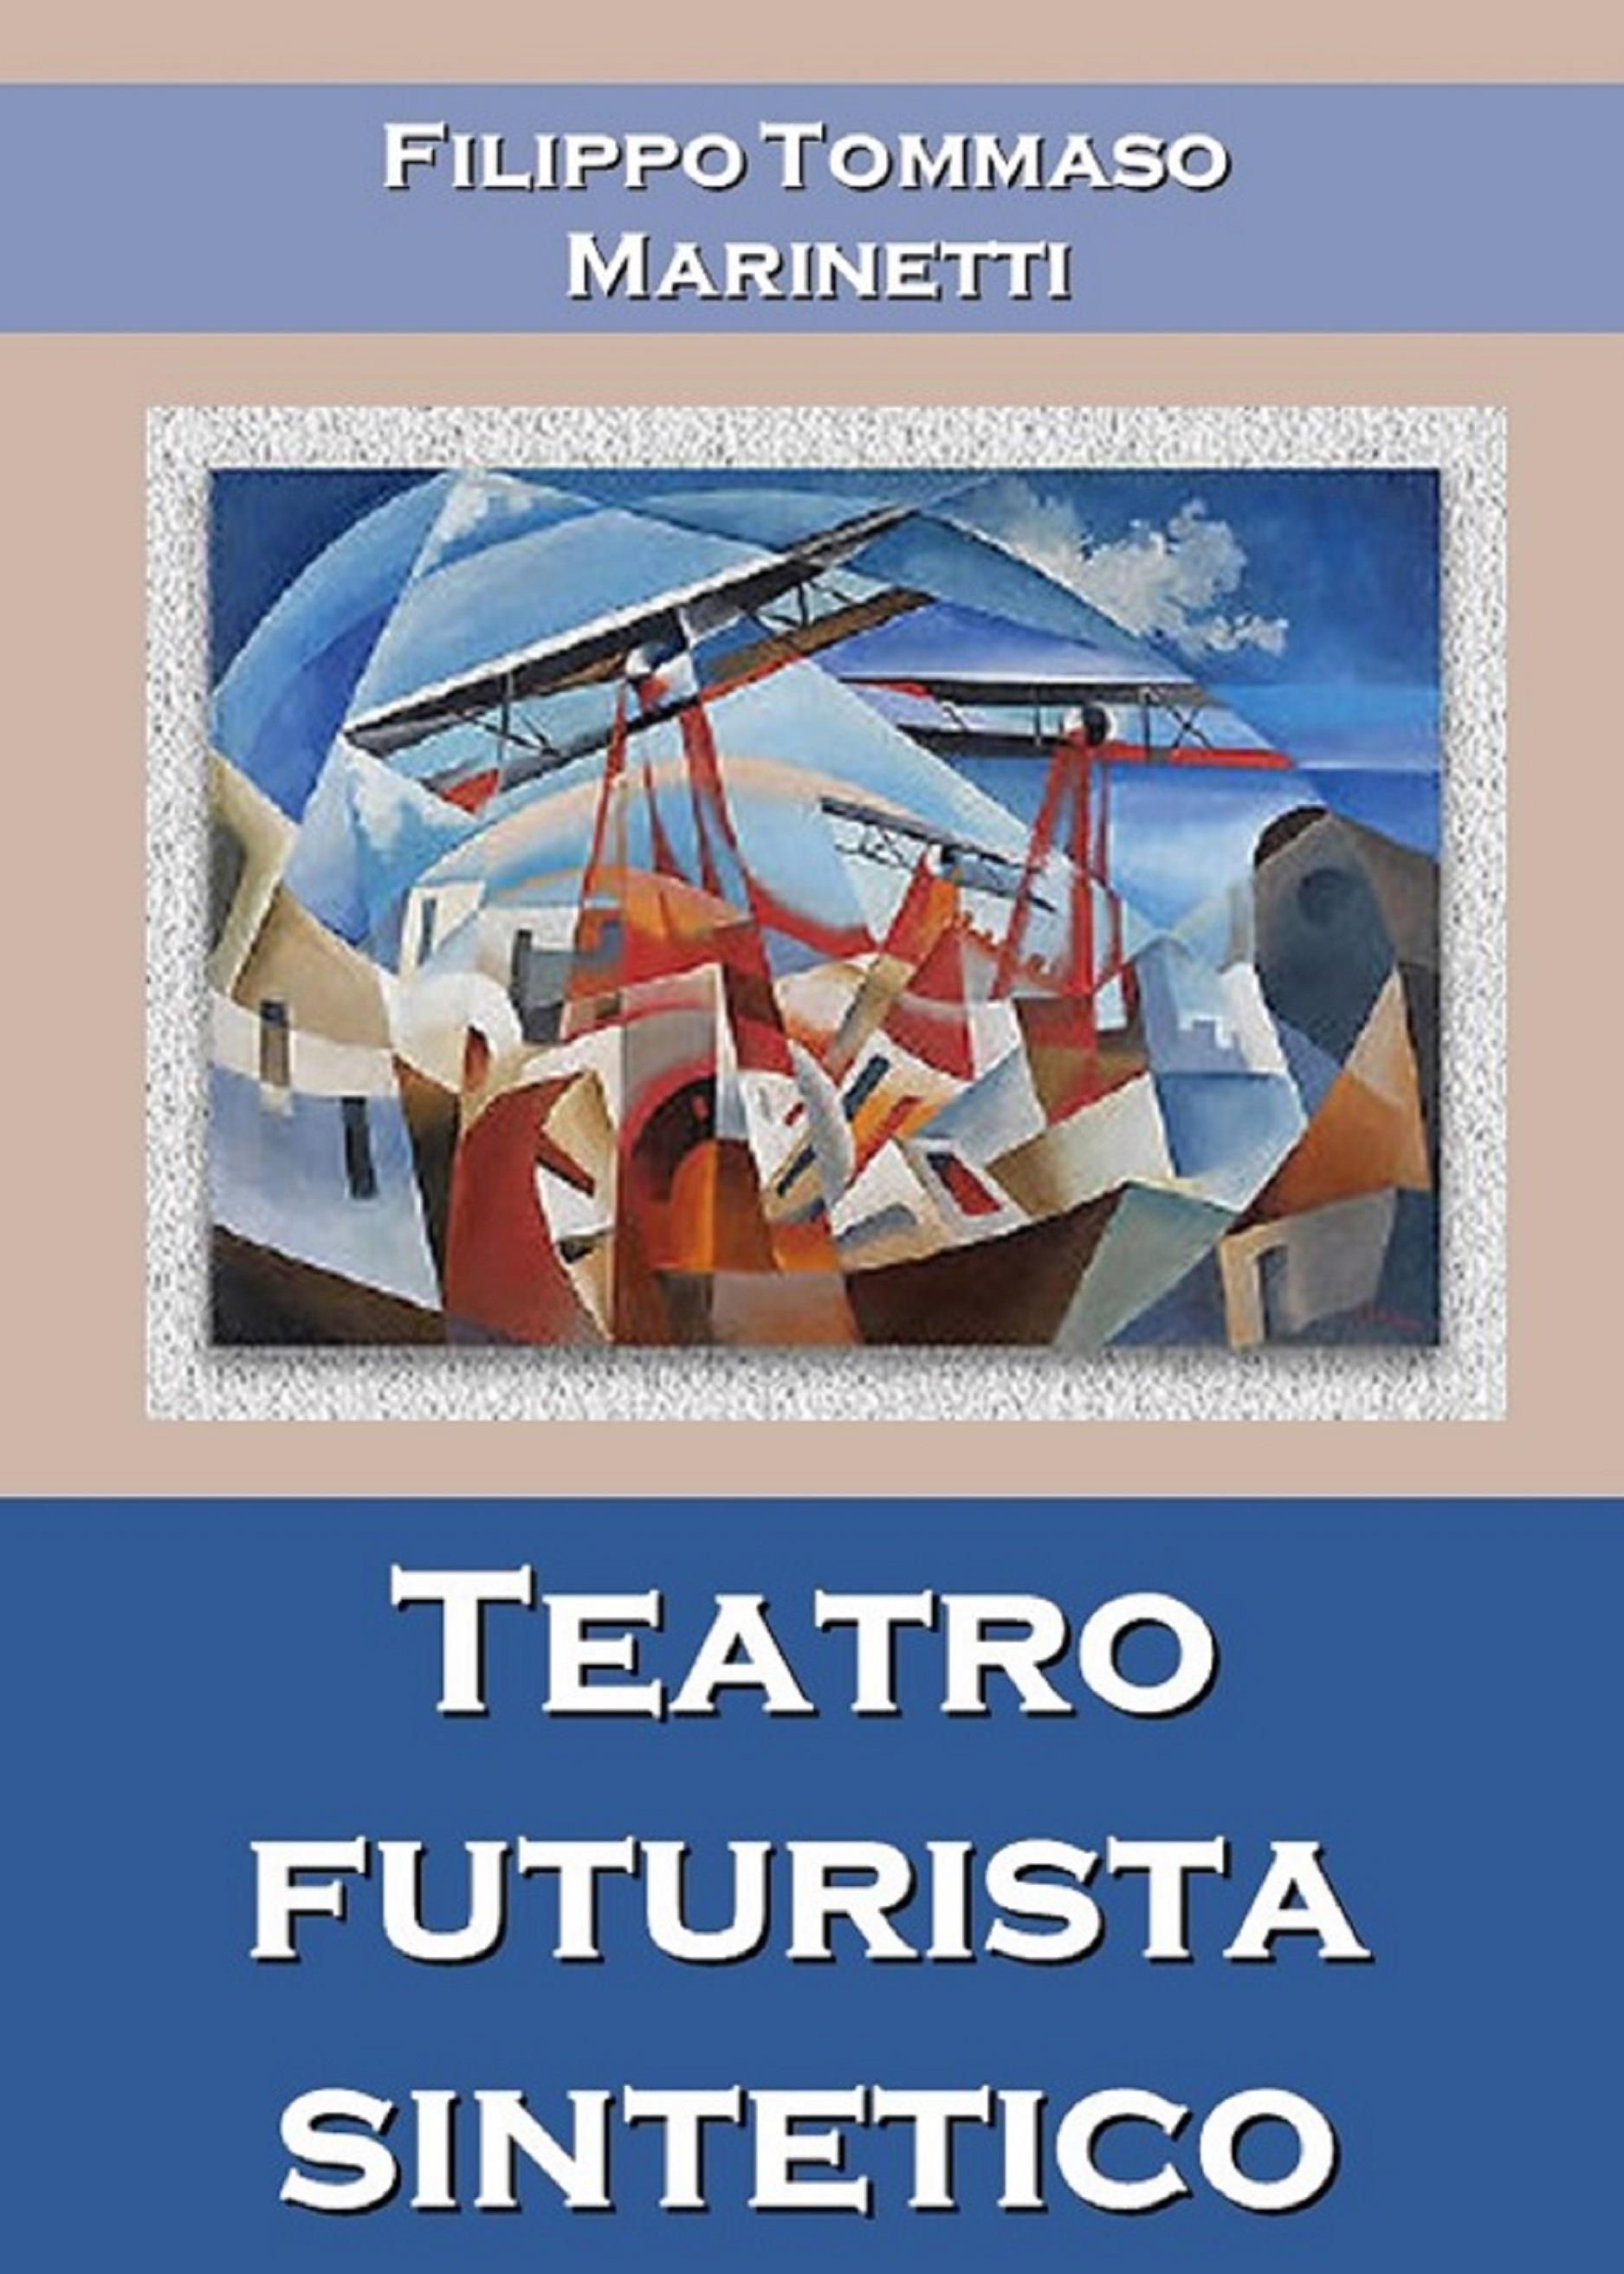 Teatro futurista sintetico